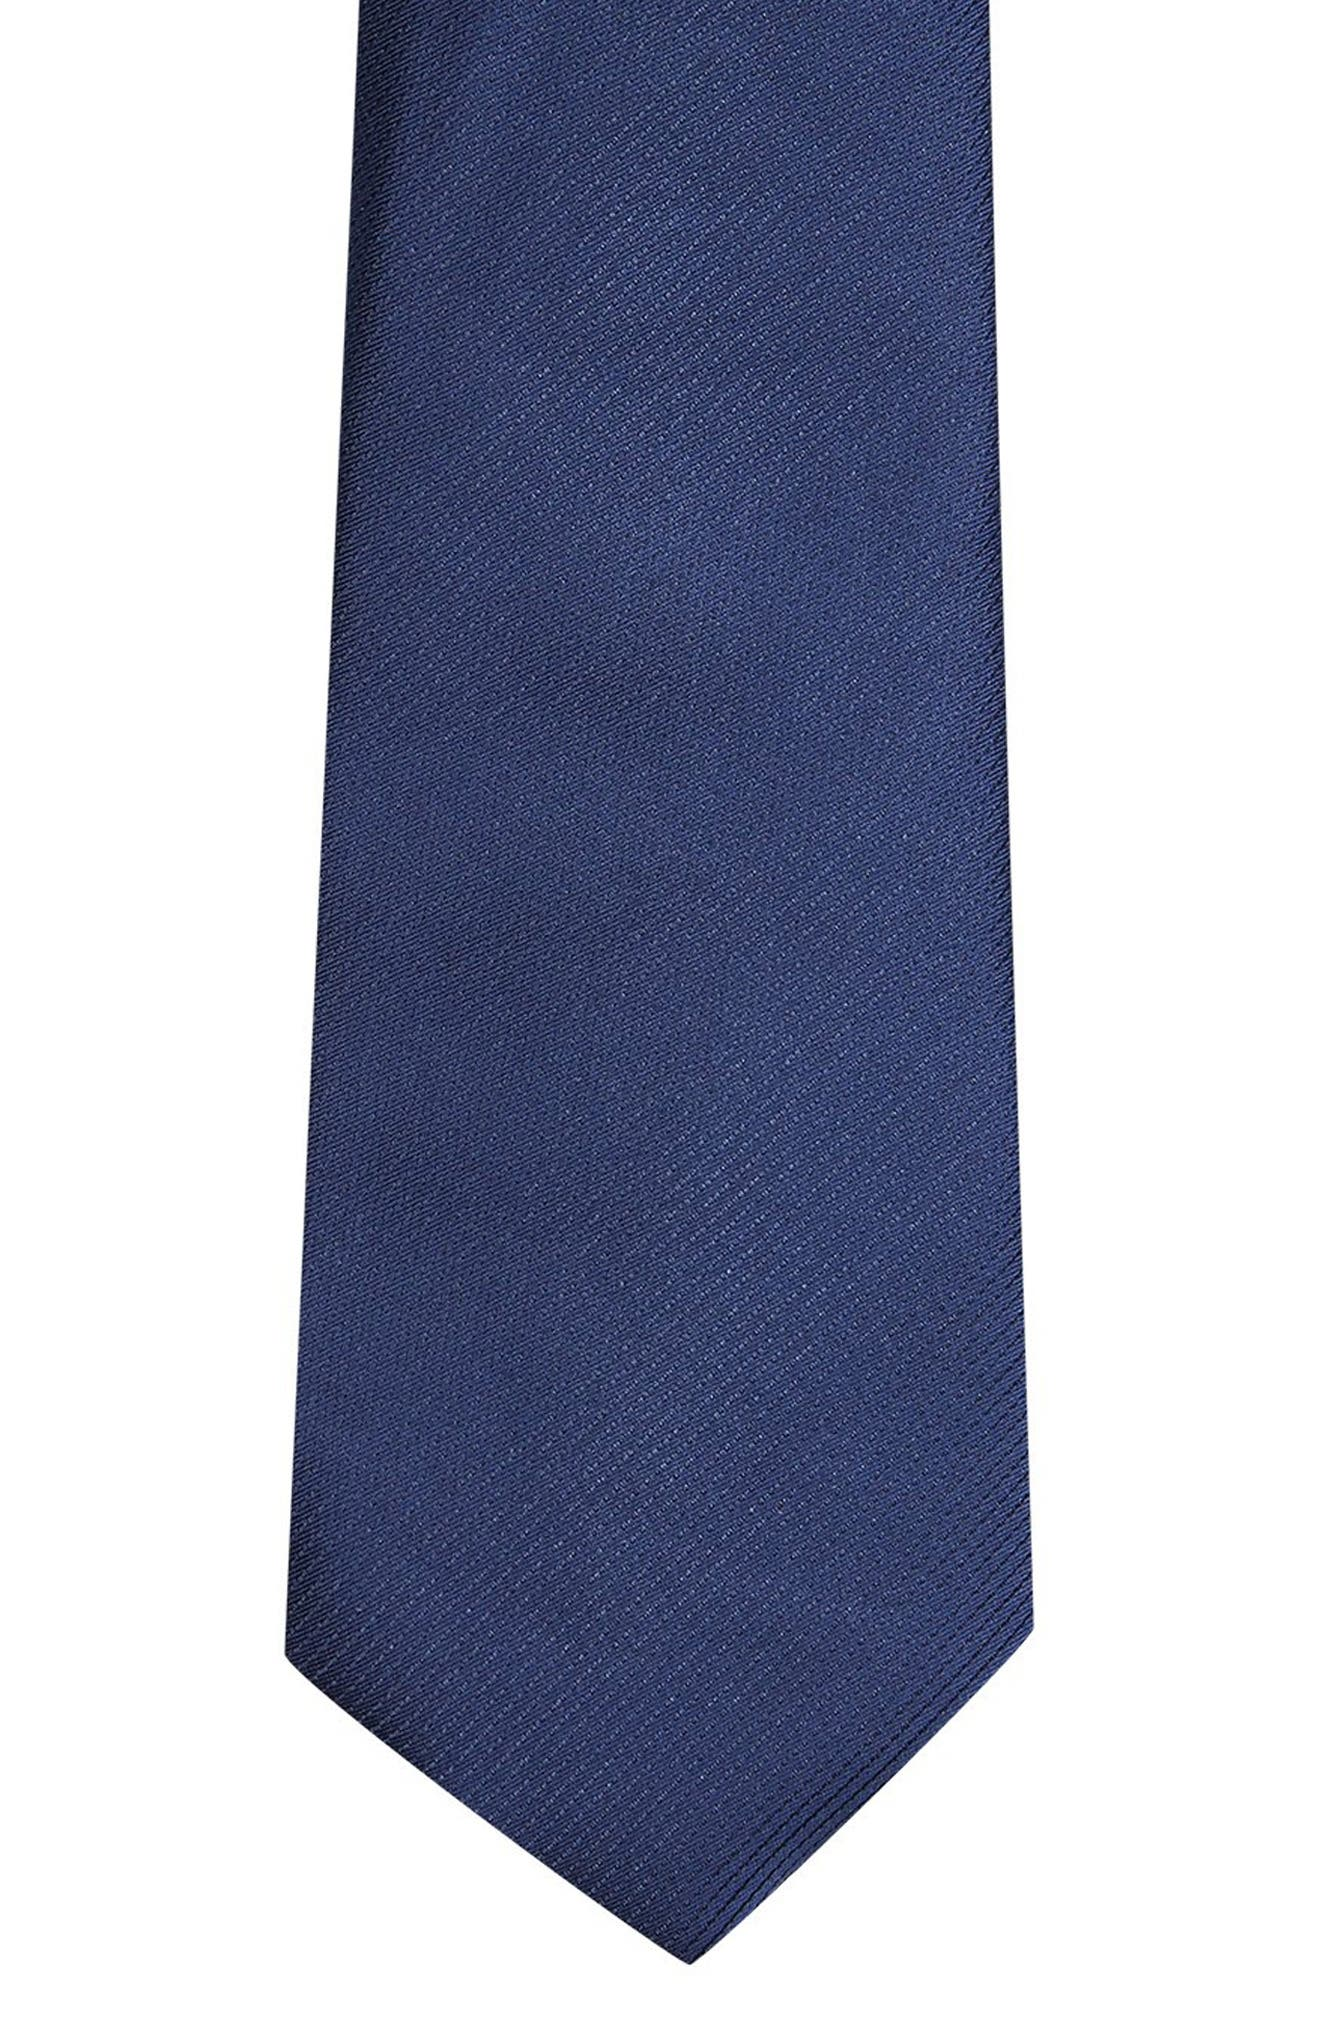 Woven Tie,                             Alternate thumbnail 2, color,                             NAVY BLUE